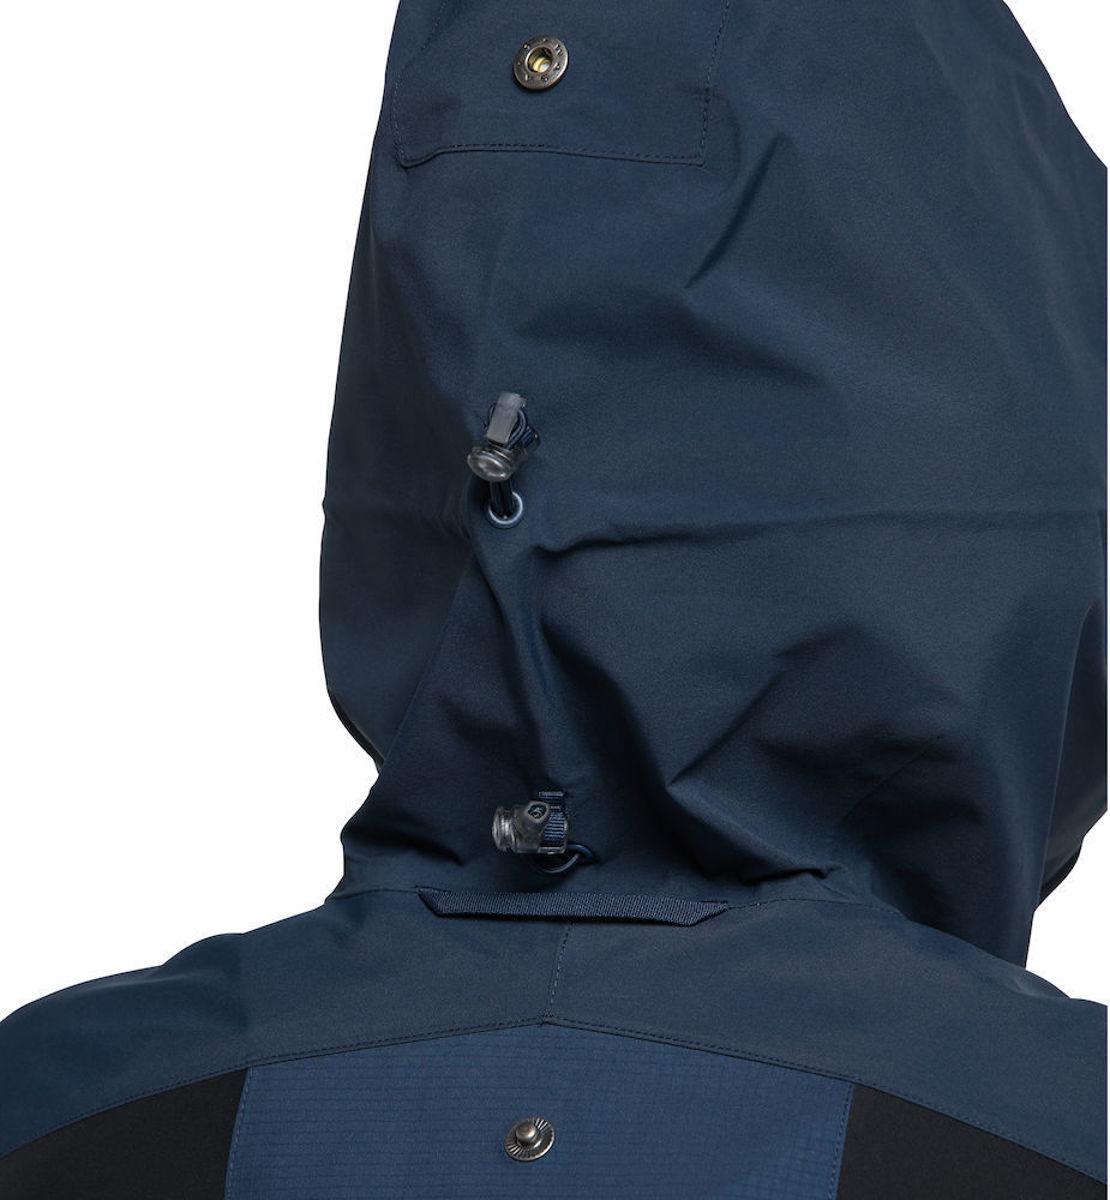 Bilde av Haglöfs  Roc Nordic GTX Pro Jacket Women 3N5 Tarn Blue